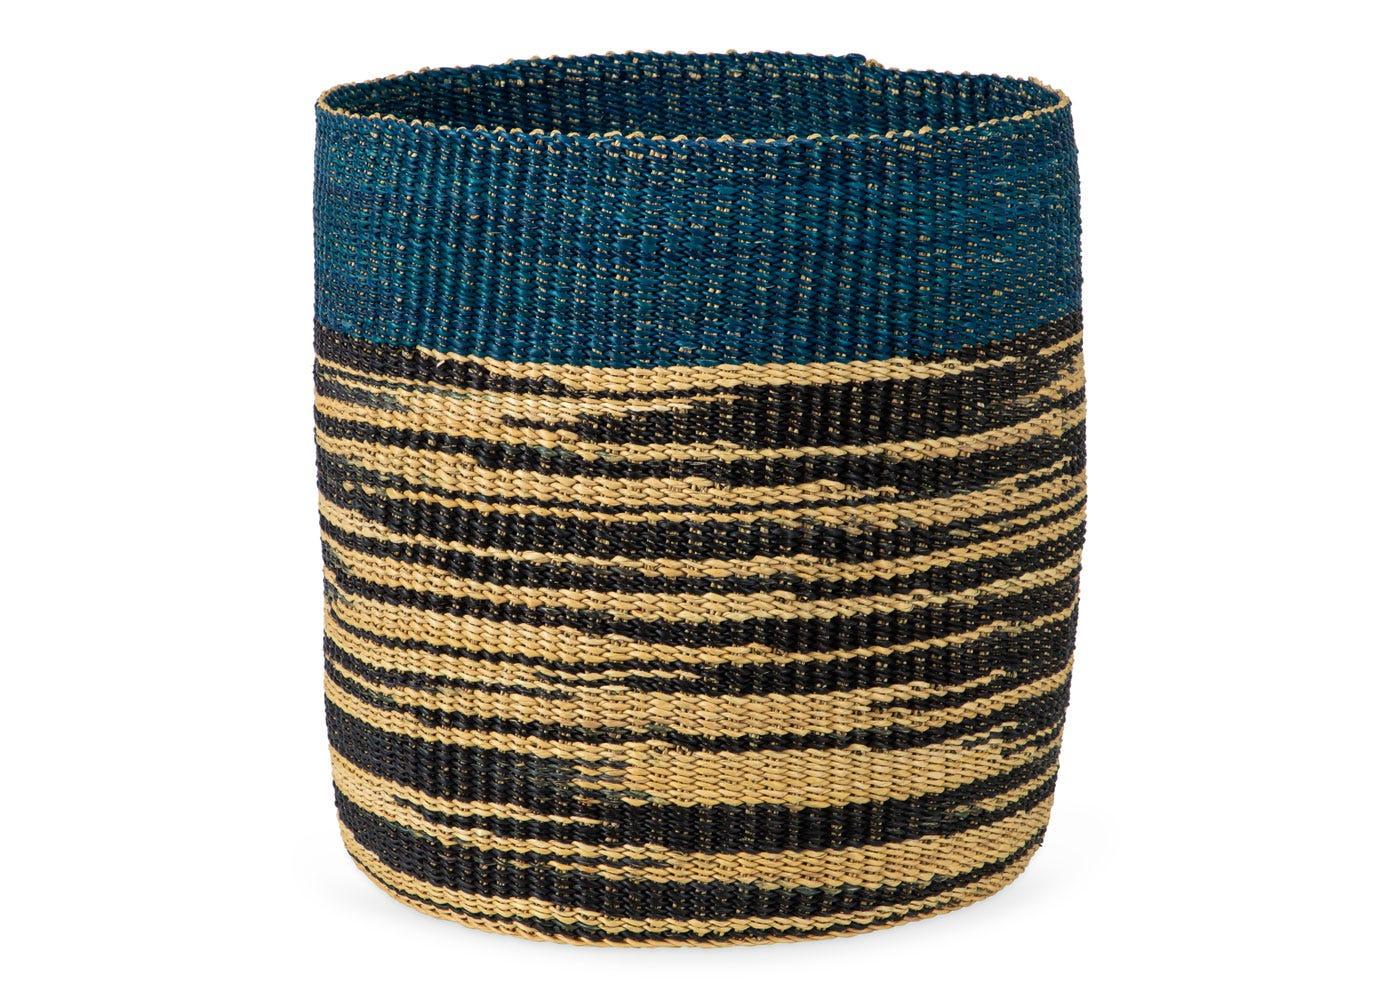 As Shown: Handwoven Storage Basket in Blue